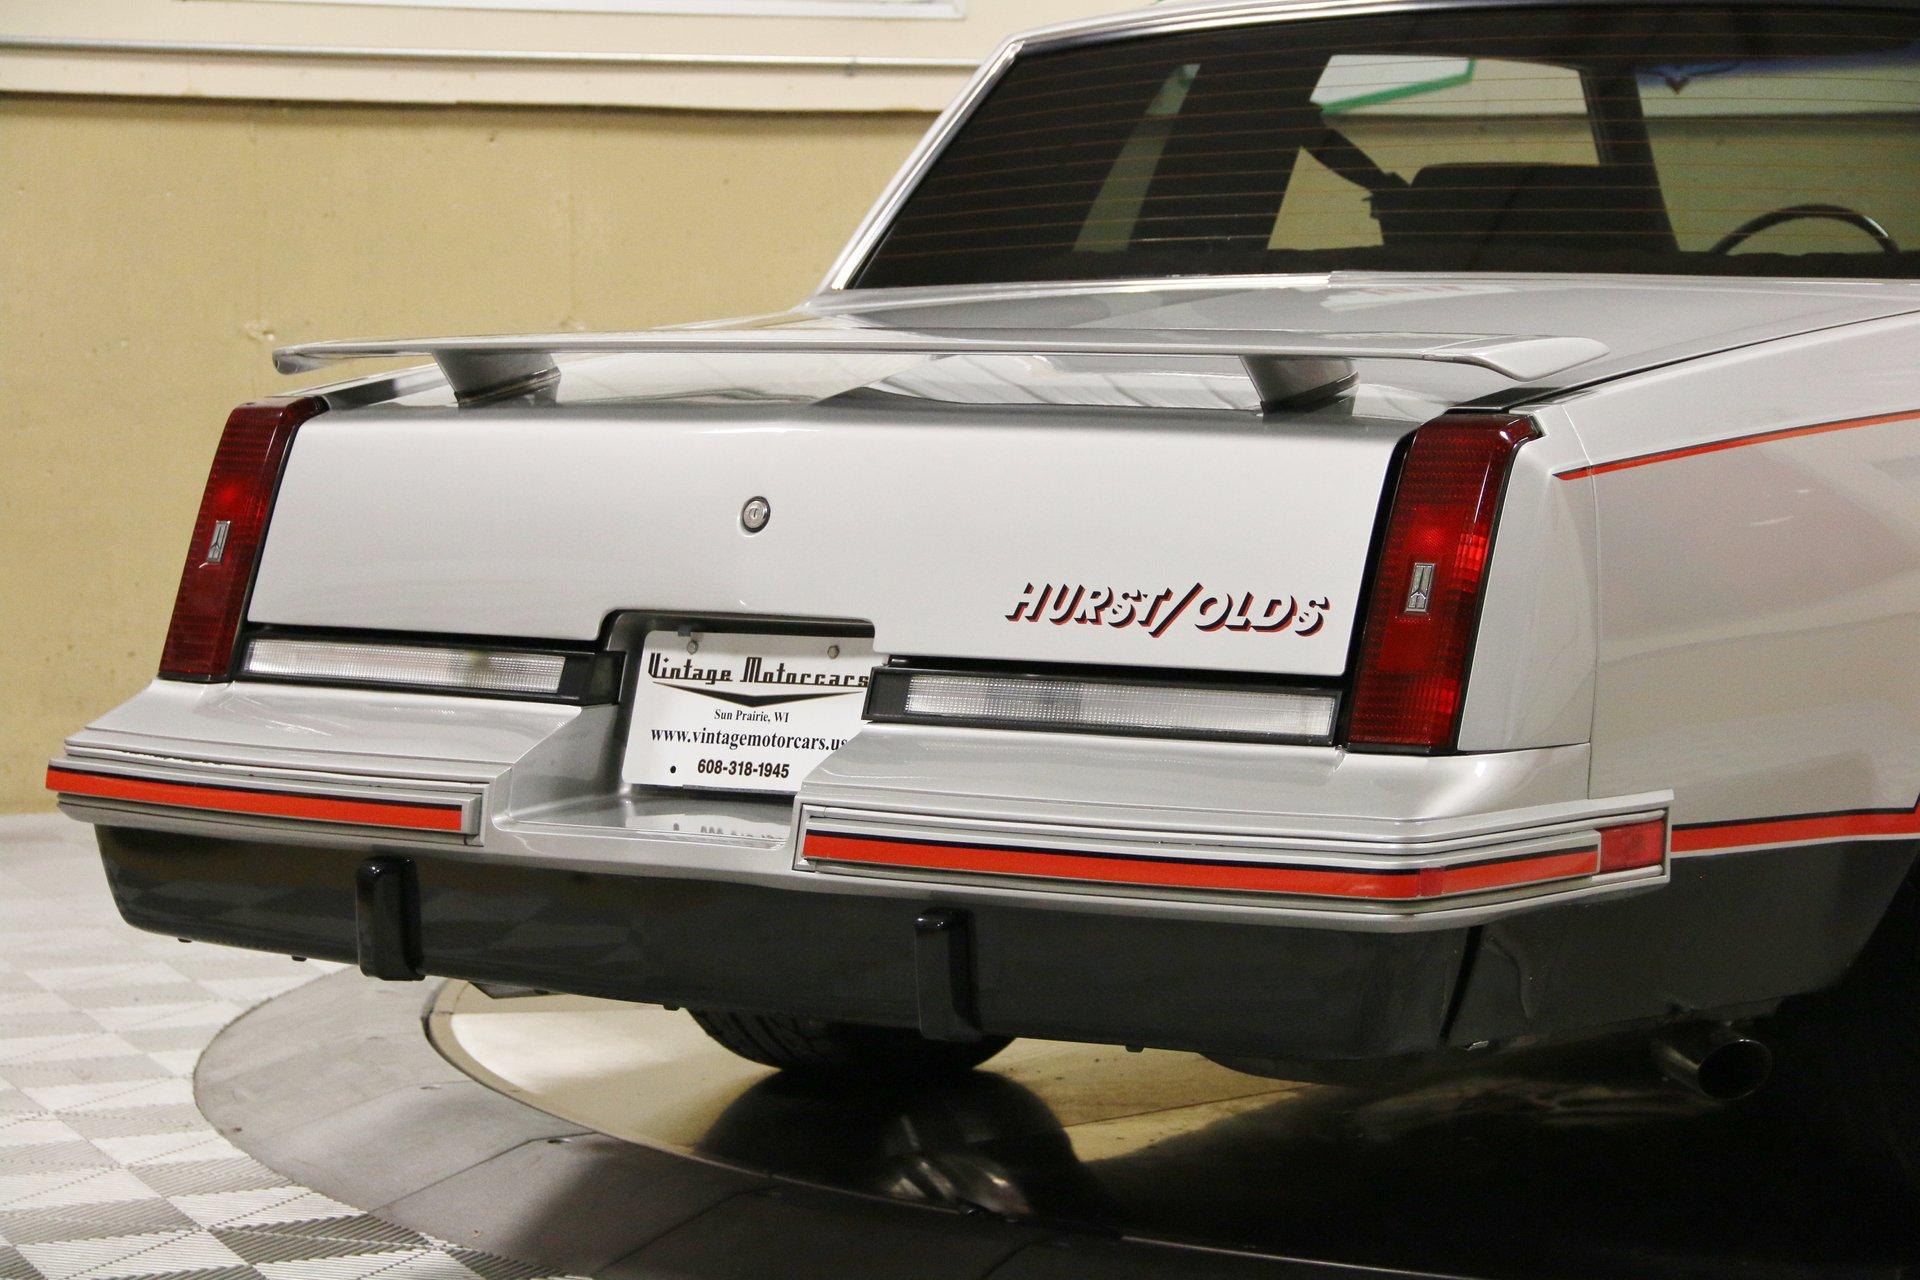 1984 Oldsmobile Cutlass Calais Hurst/Olds for sale #103488   MCG